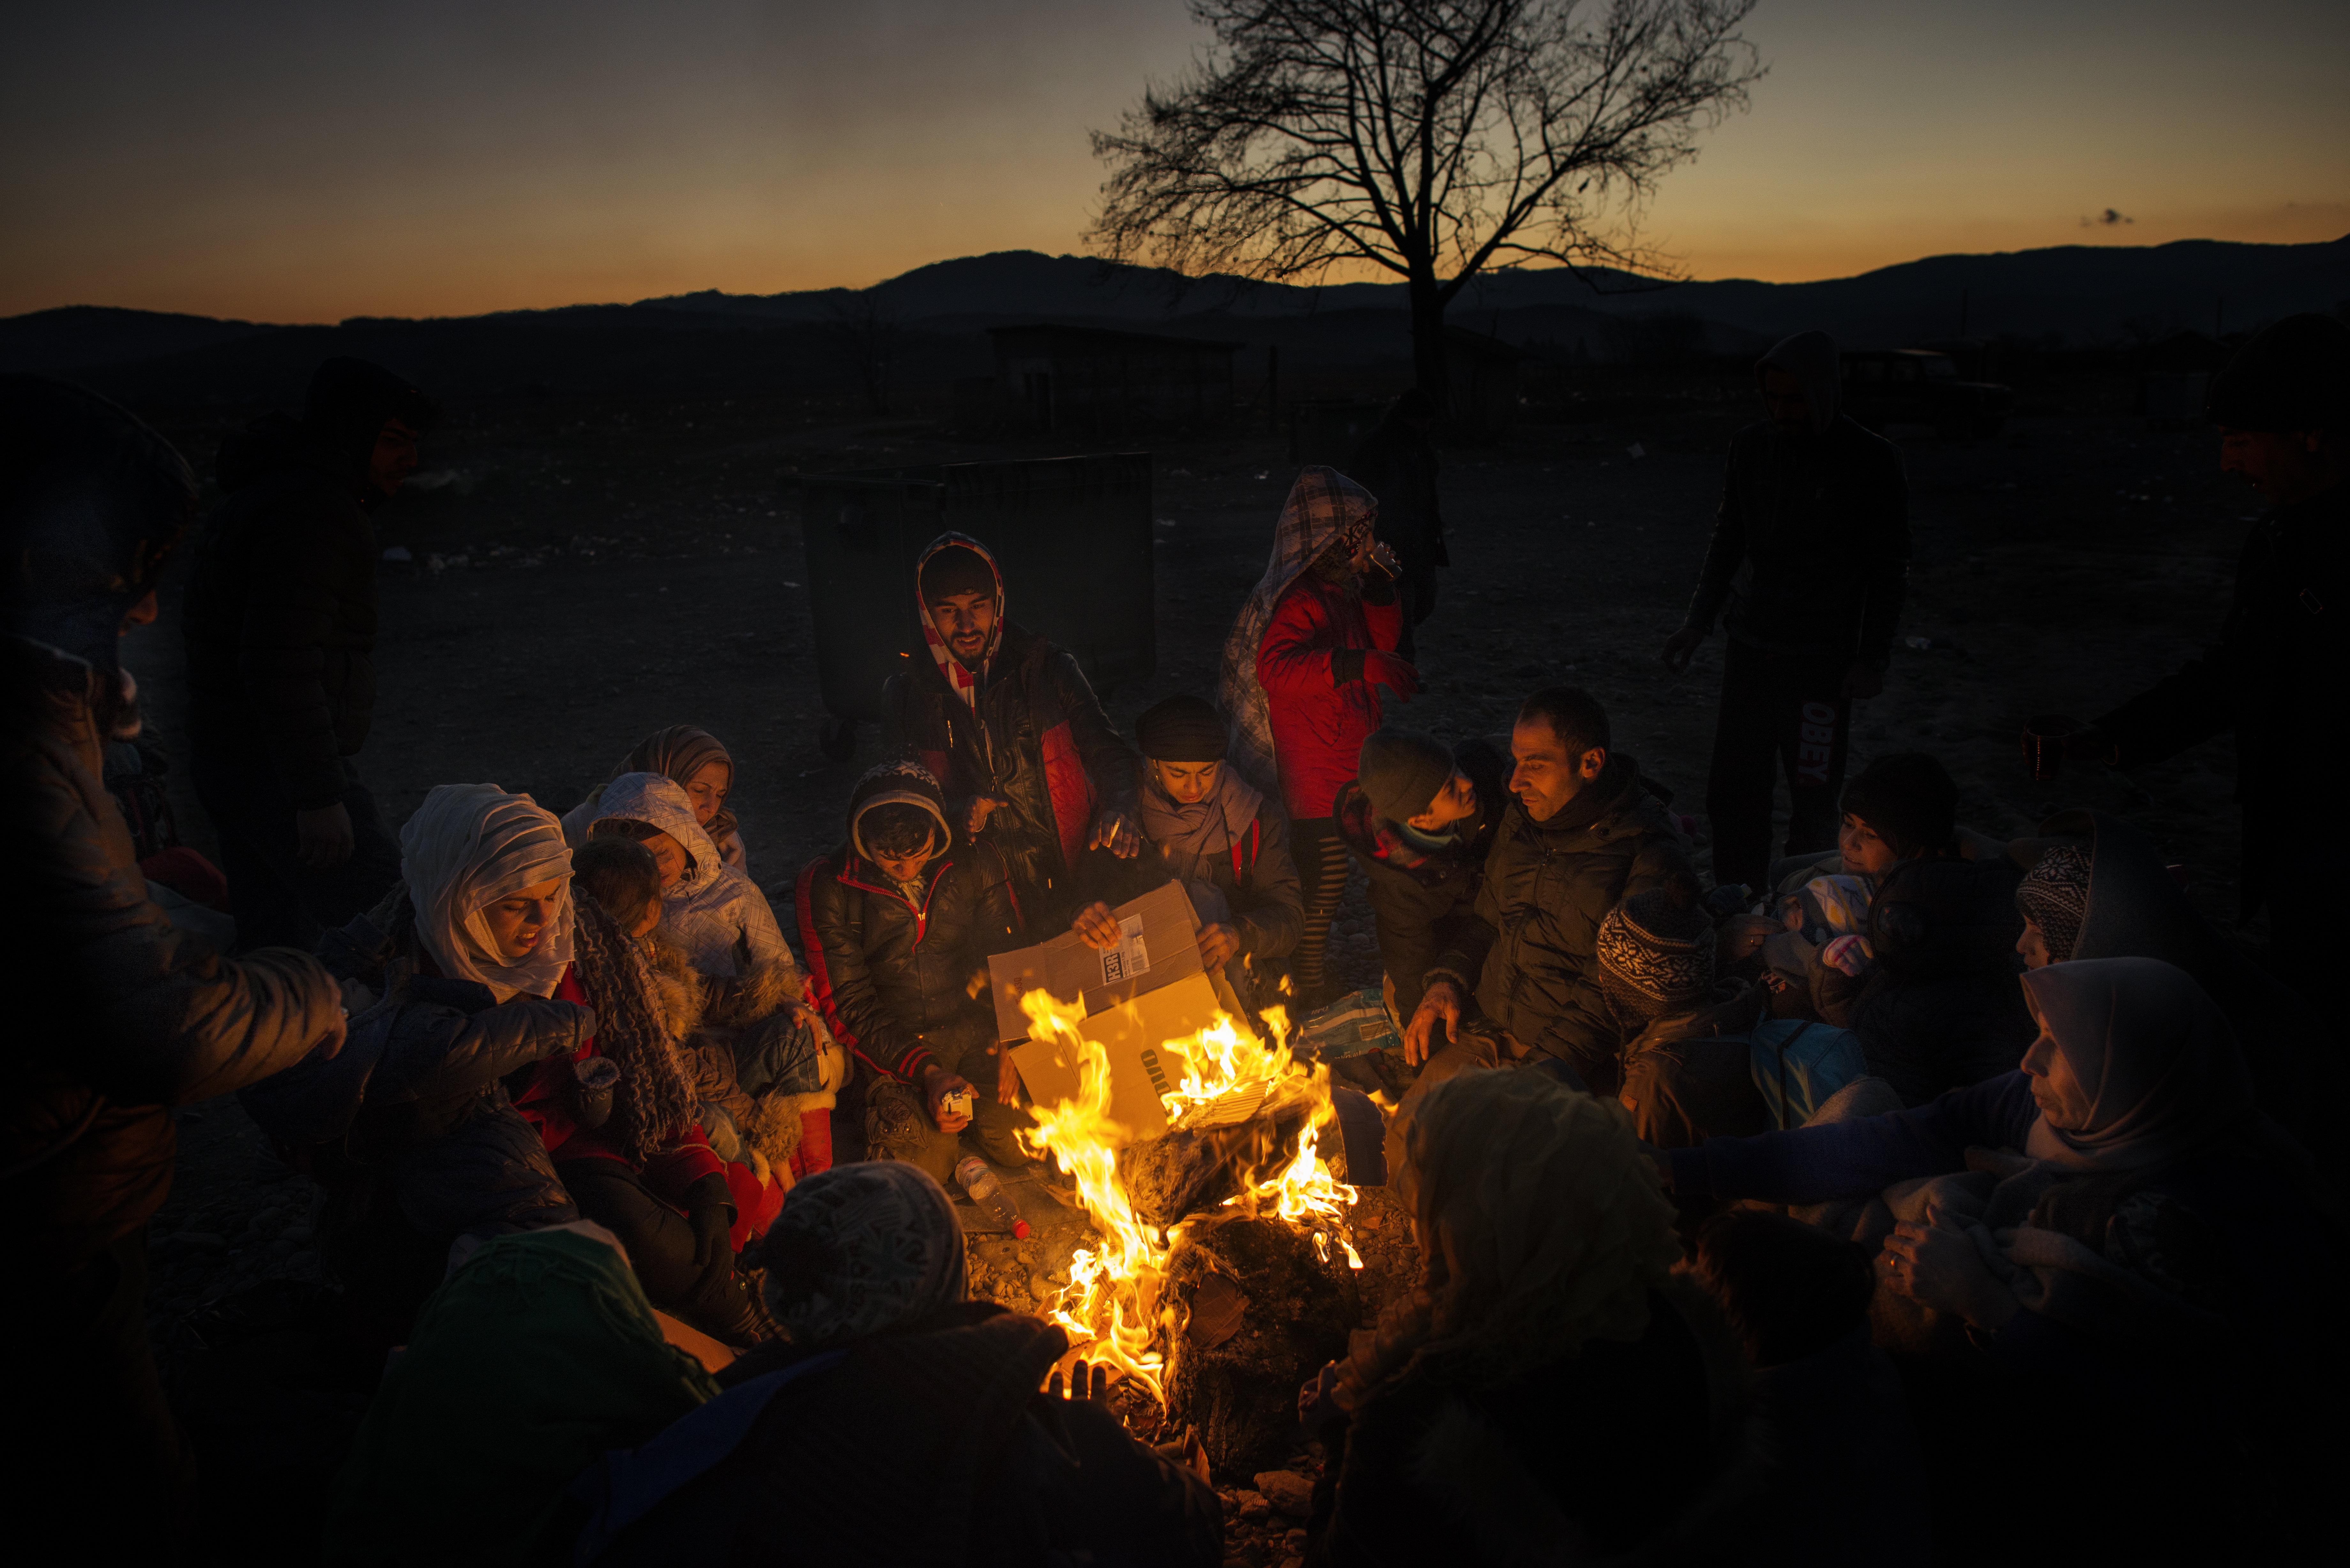 Migranti in fuga dall'Isis (LaPresse)